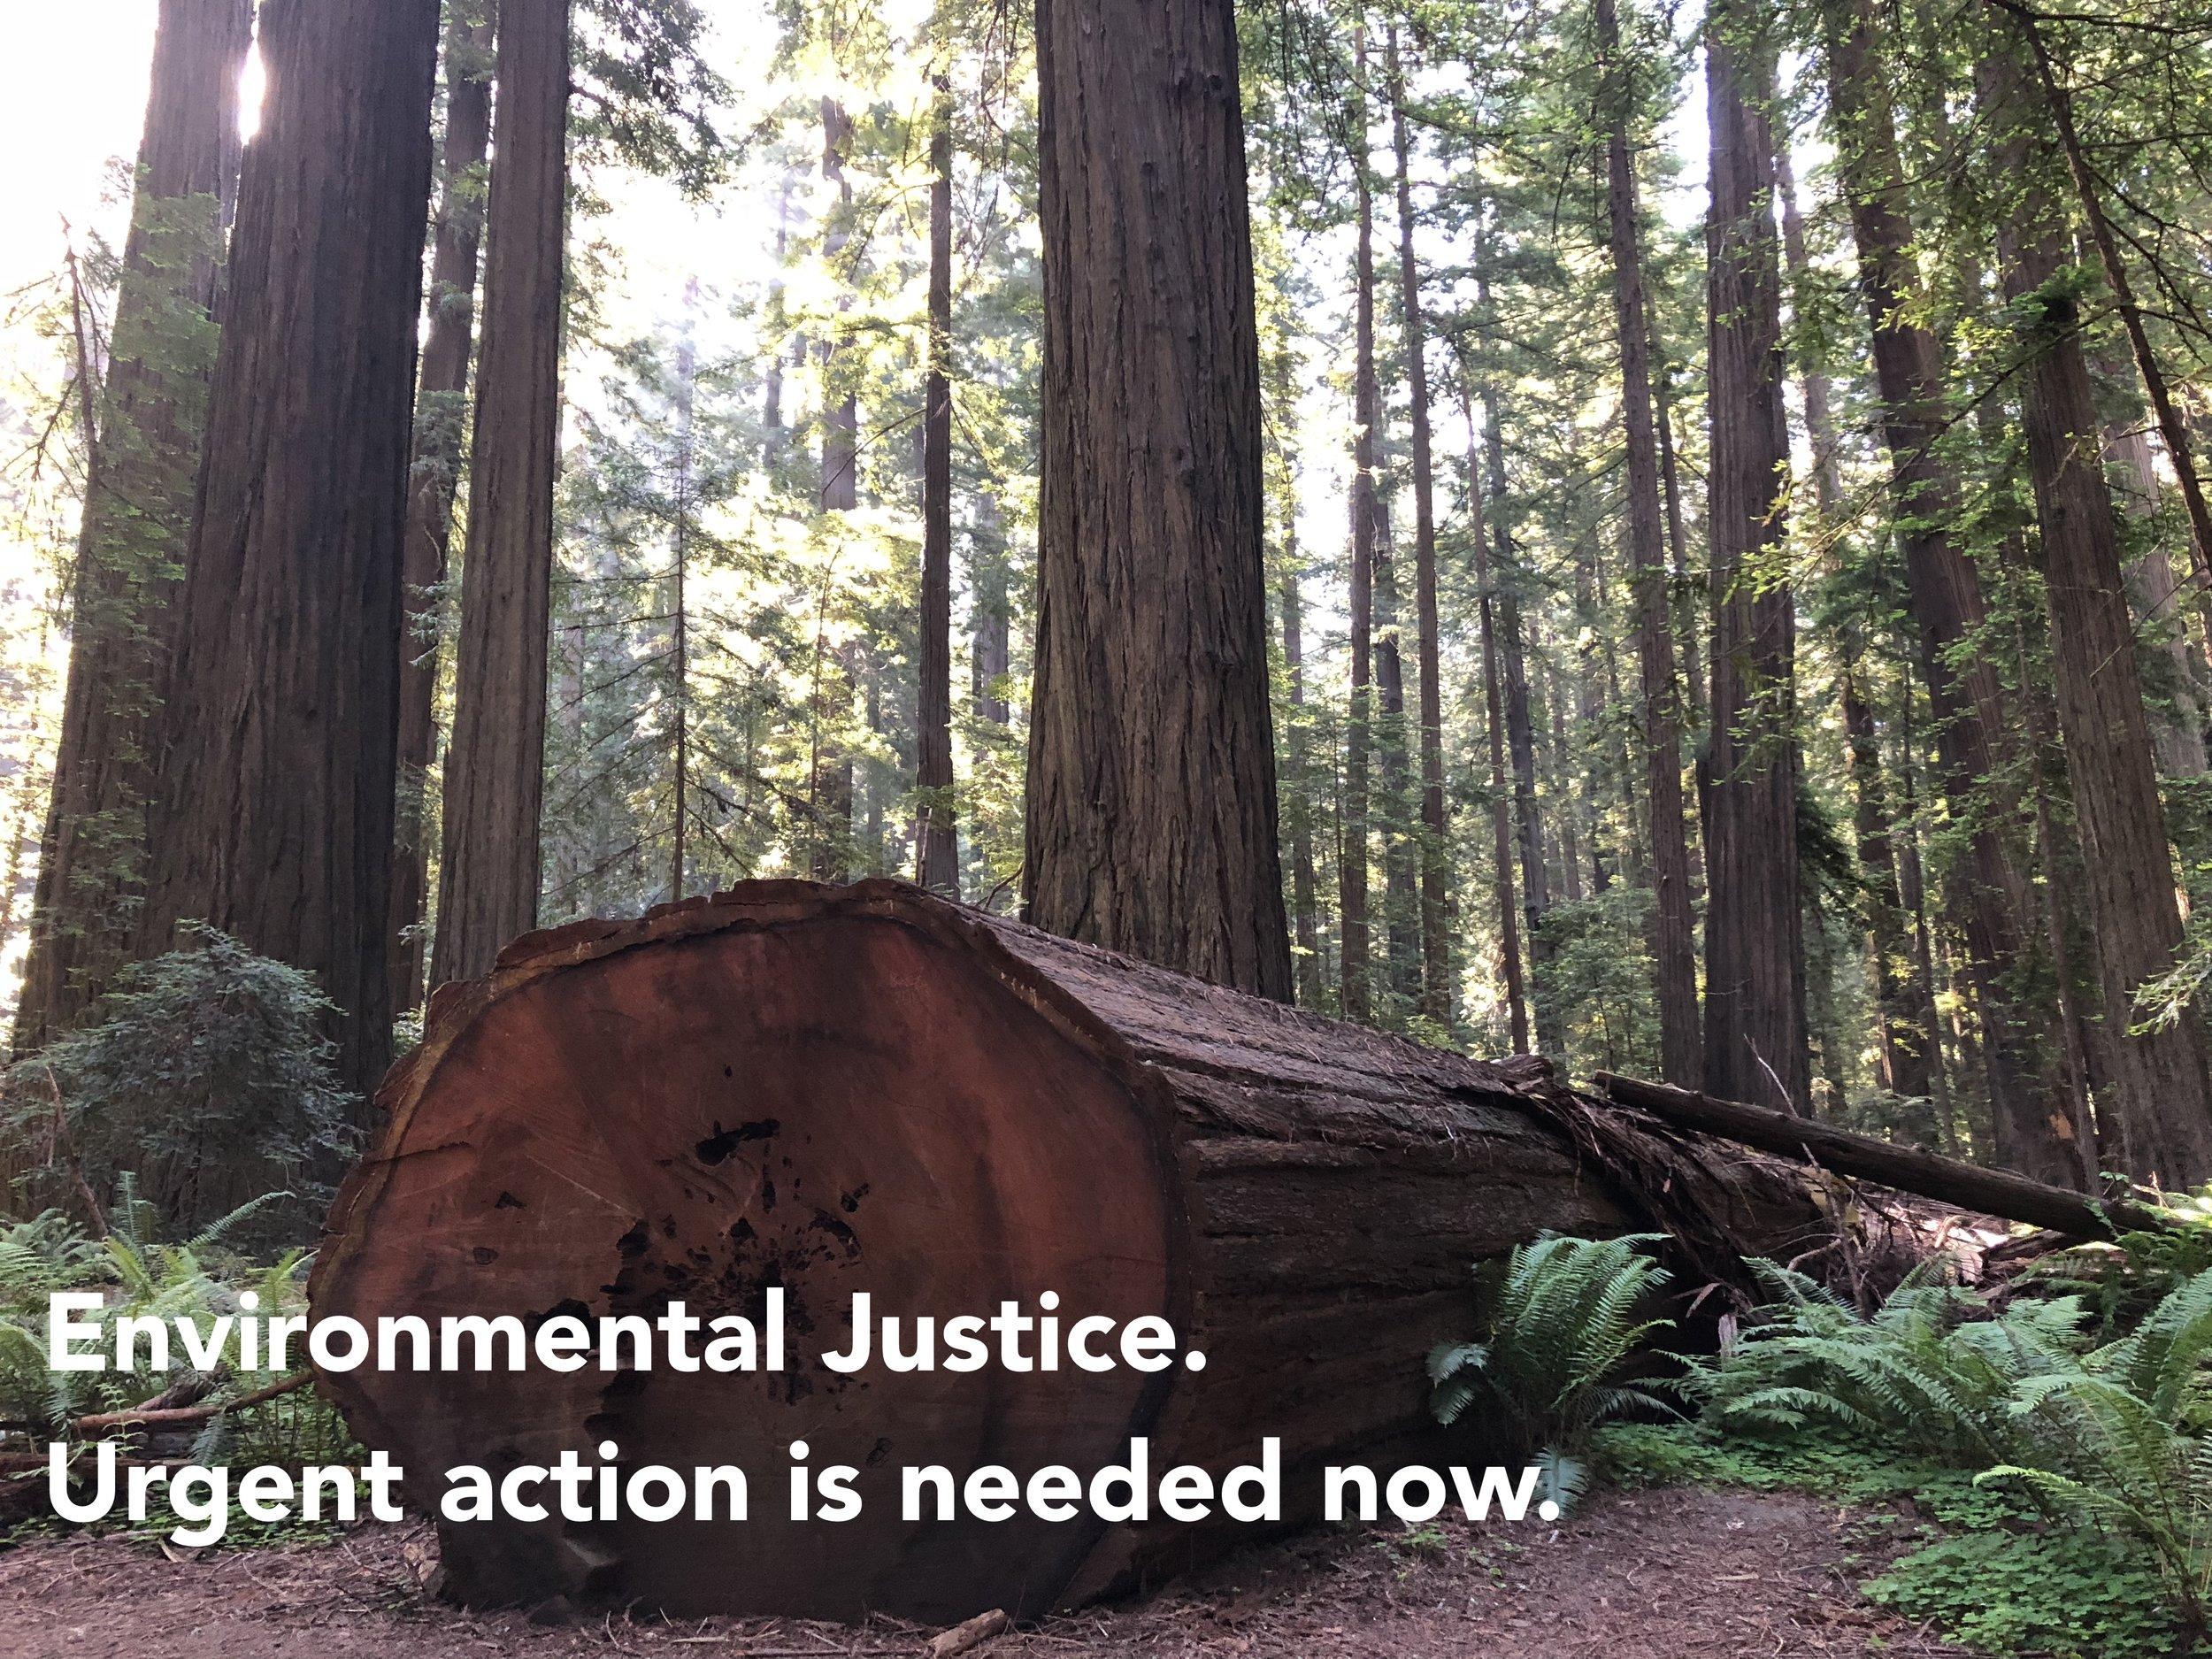 Environmental Justice.jpg